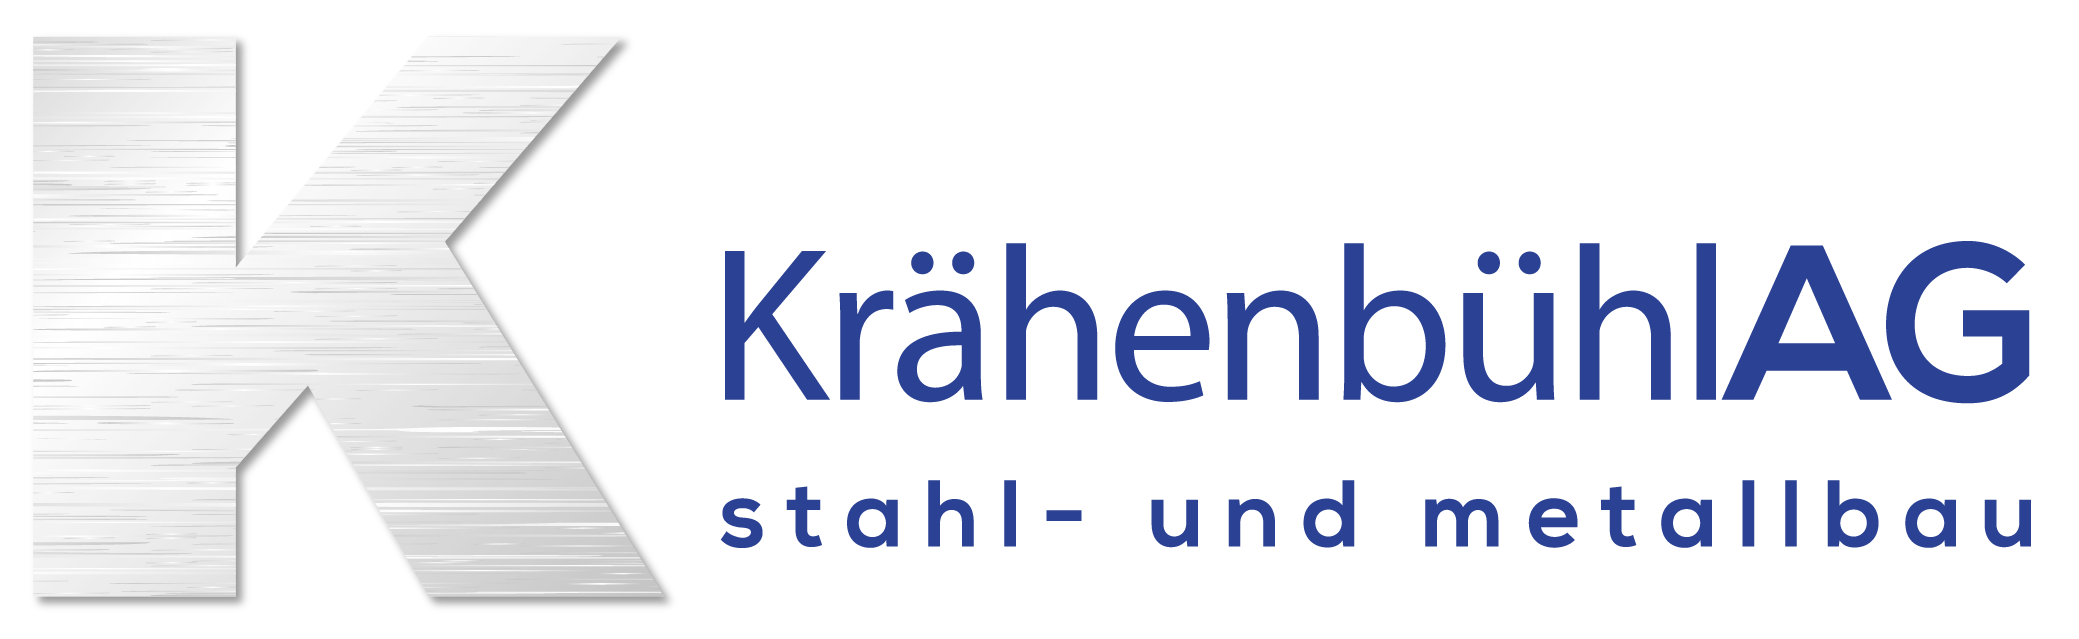 Krähenbühl AG